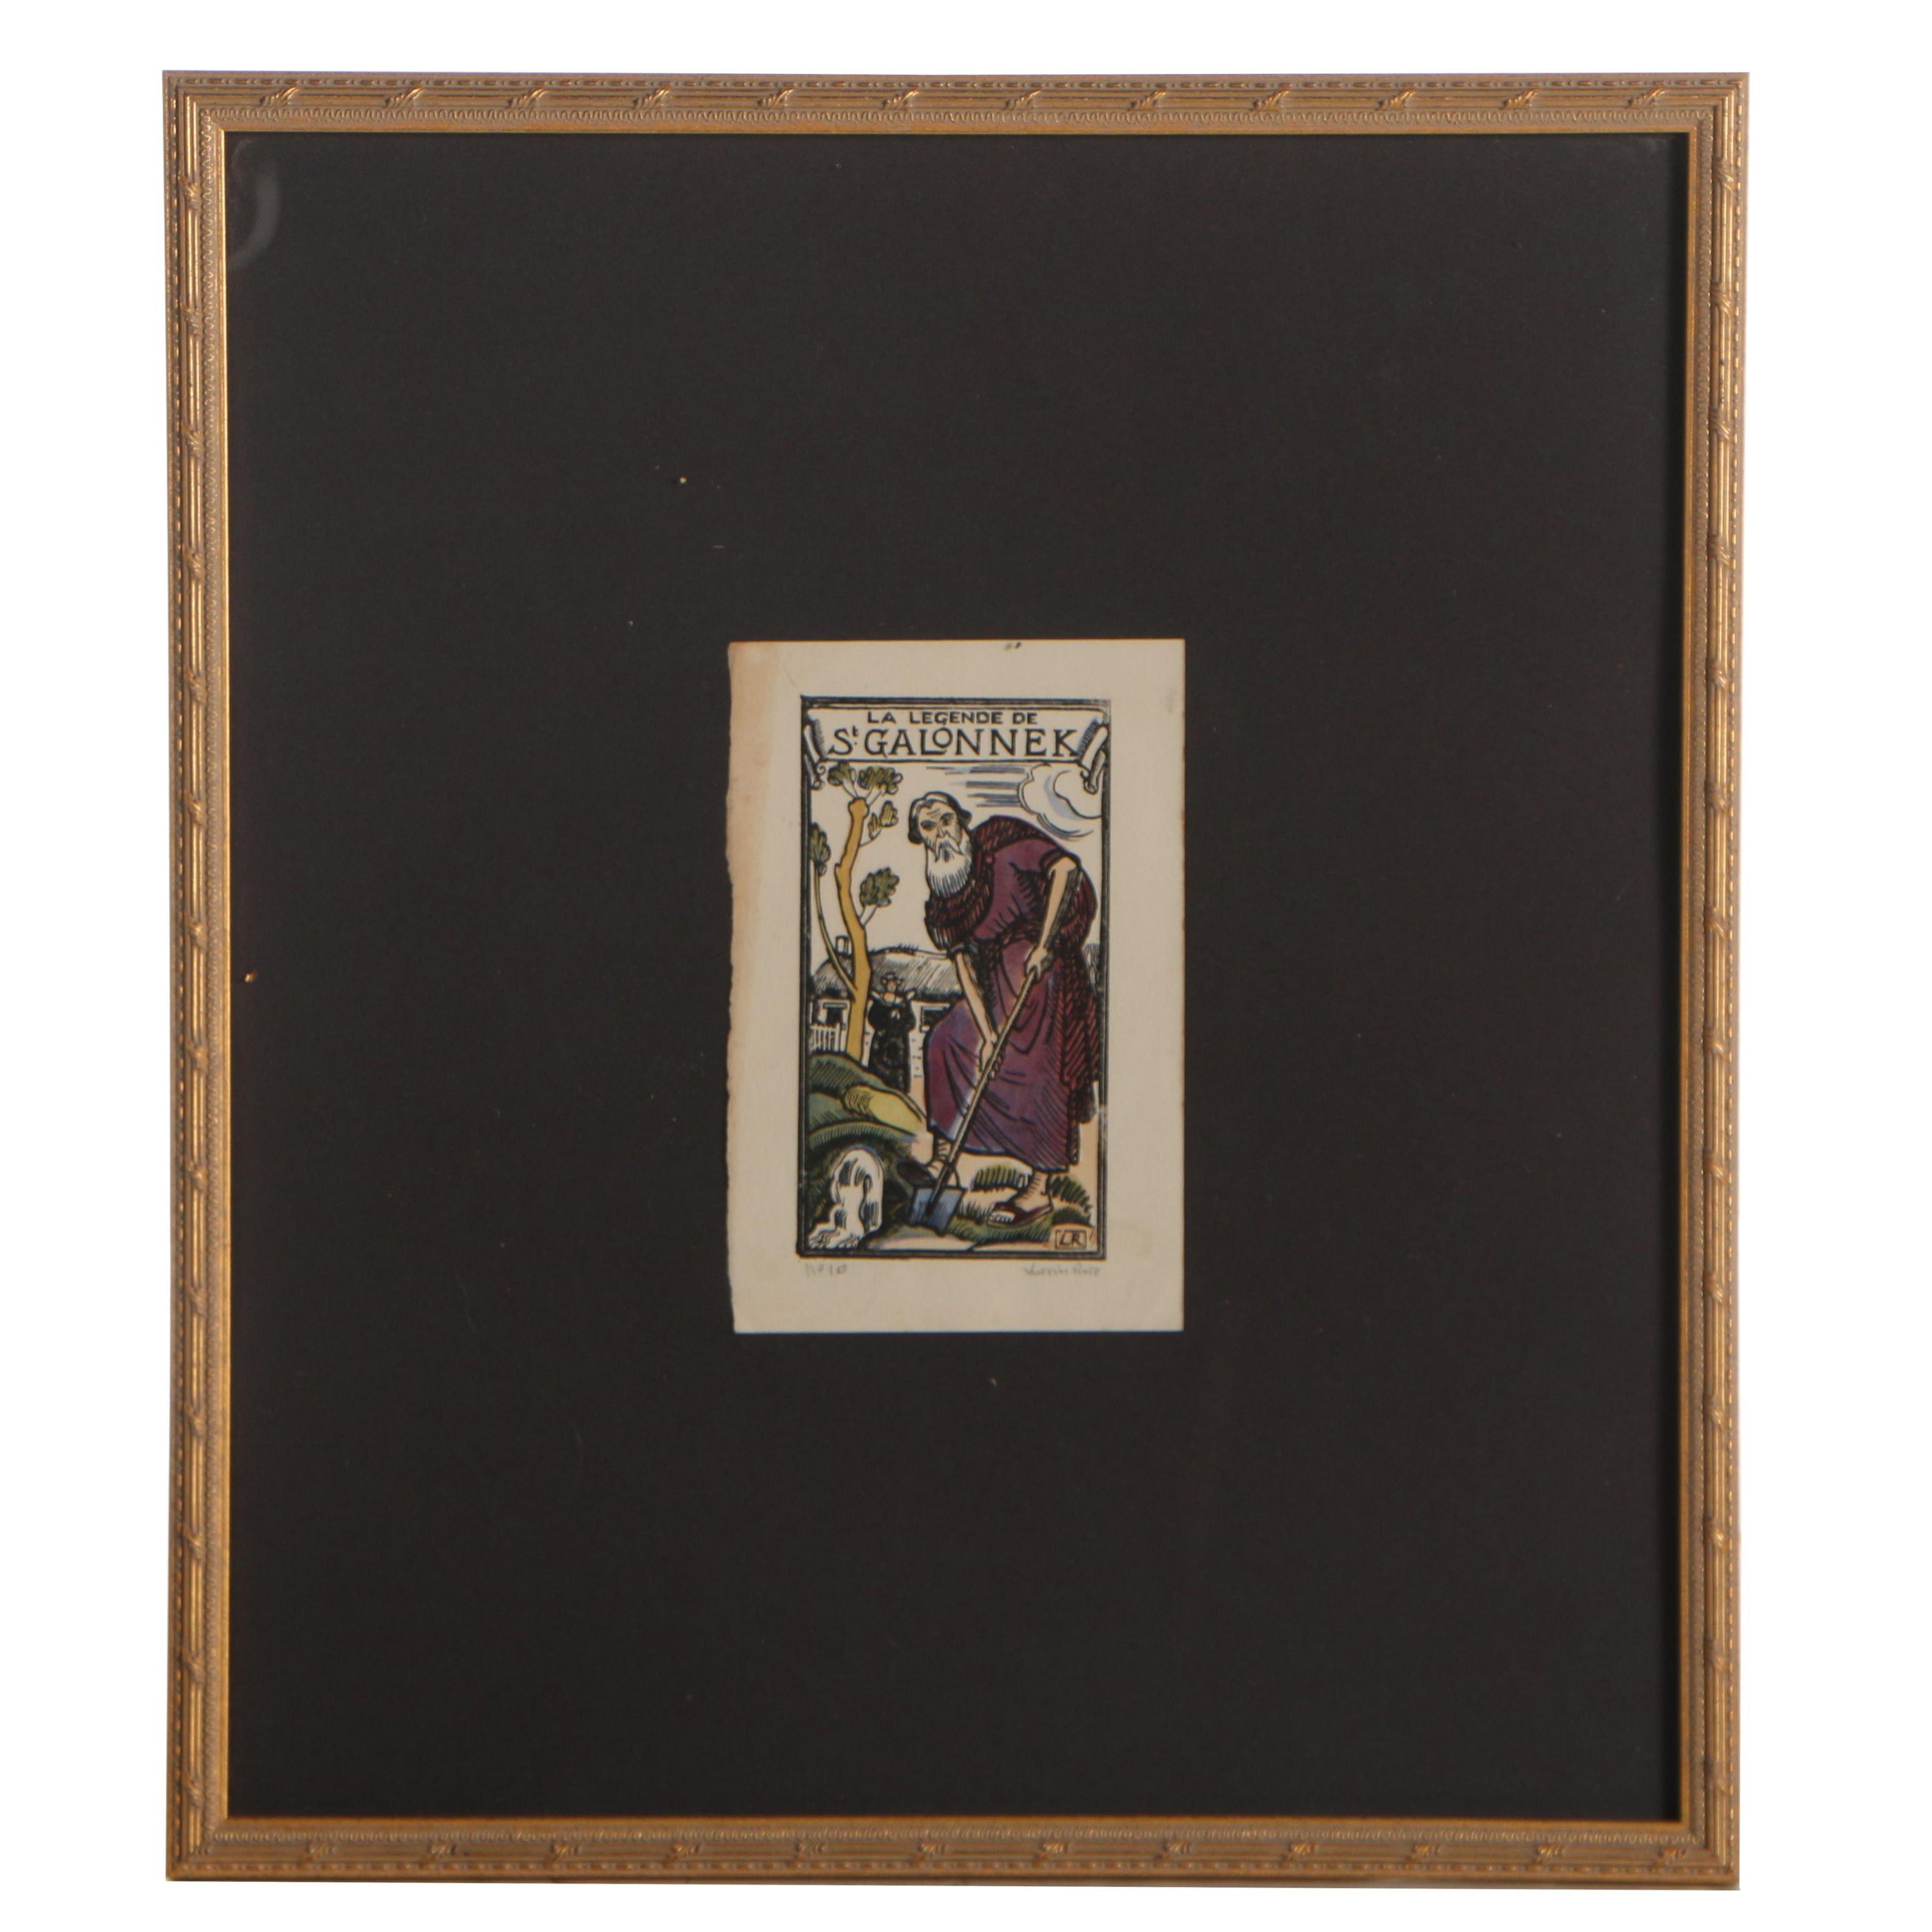 "Relief Print Designed by Ludovic-Rodo Pissarro ""La Legende de St. Galonnek"""